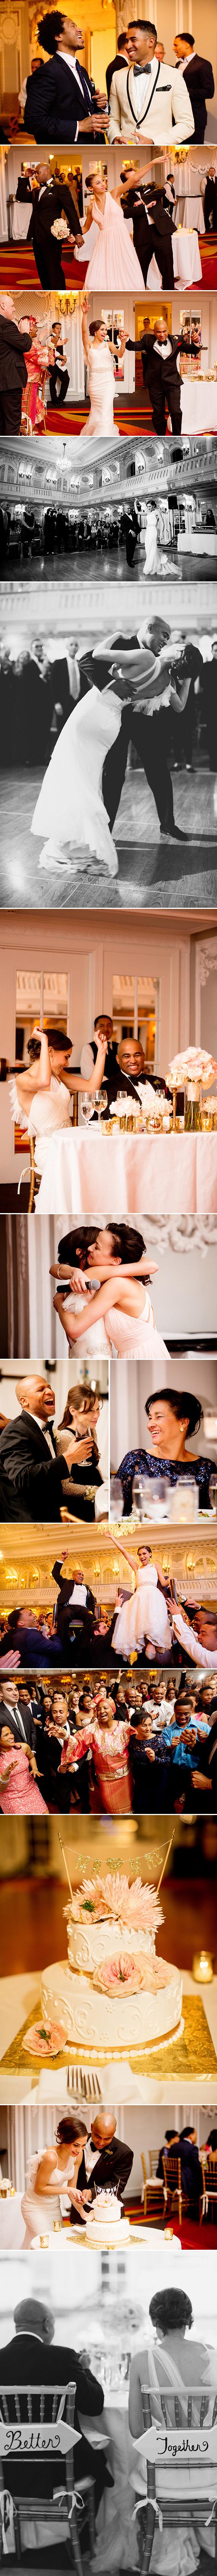 Chicago Wedding at The Renaissance Hotel